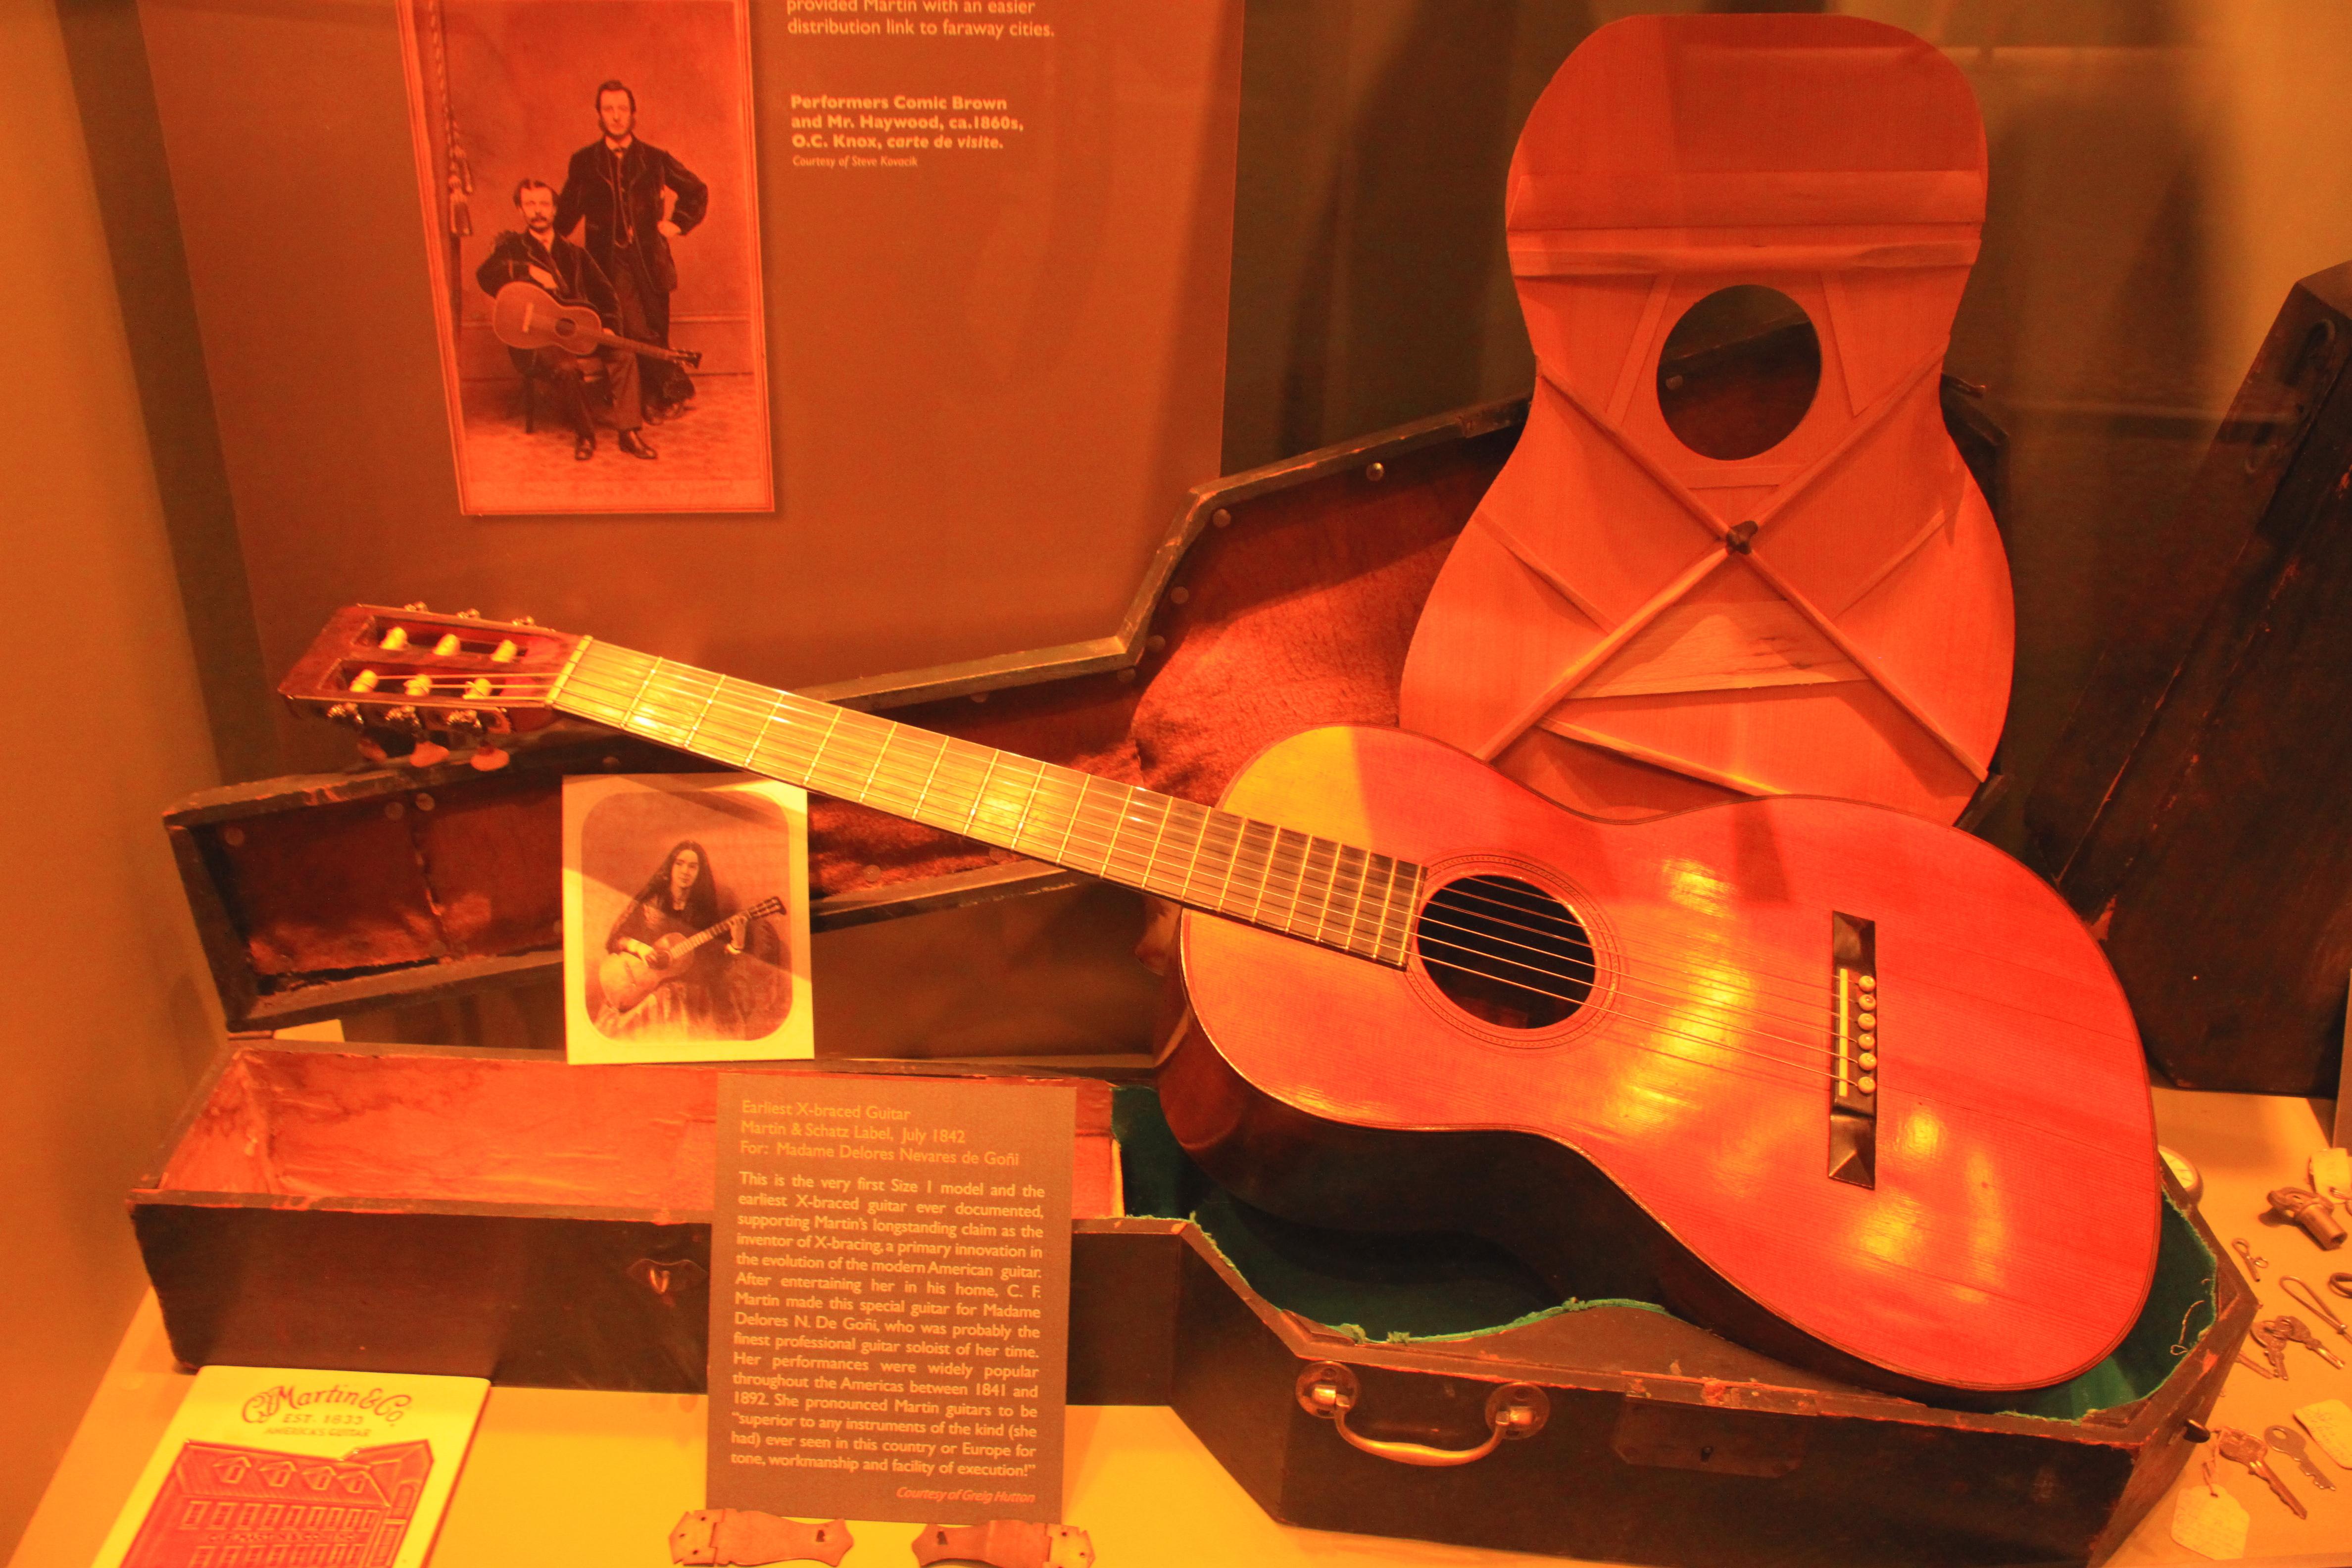 FileEarliest X Braced Guitar July 1842 Martin Schatz Label For Delores Nevares De Goni